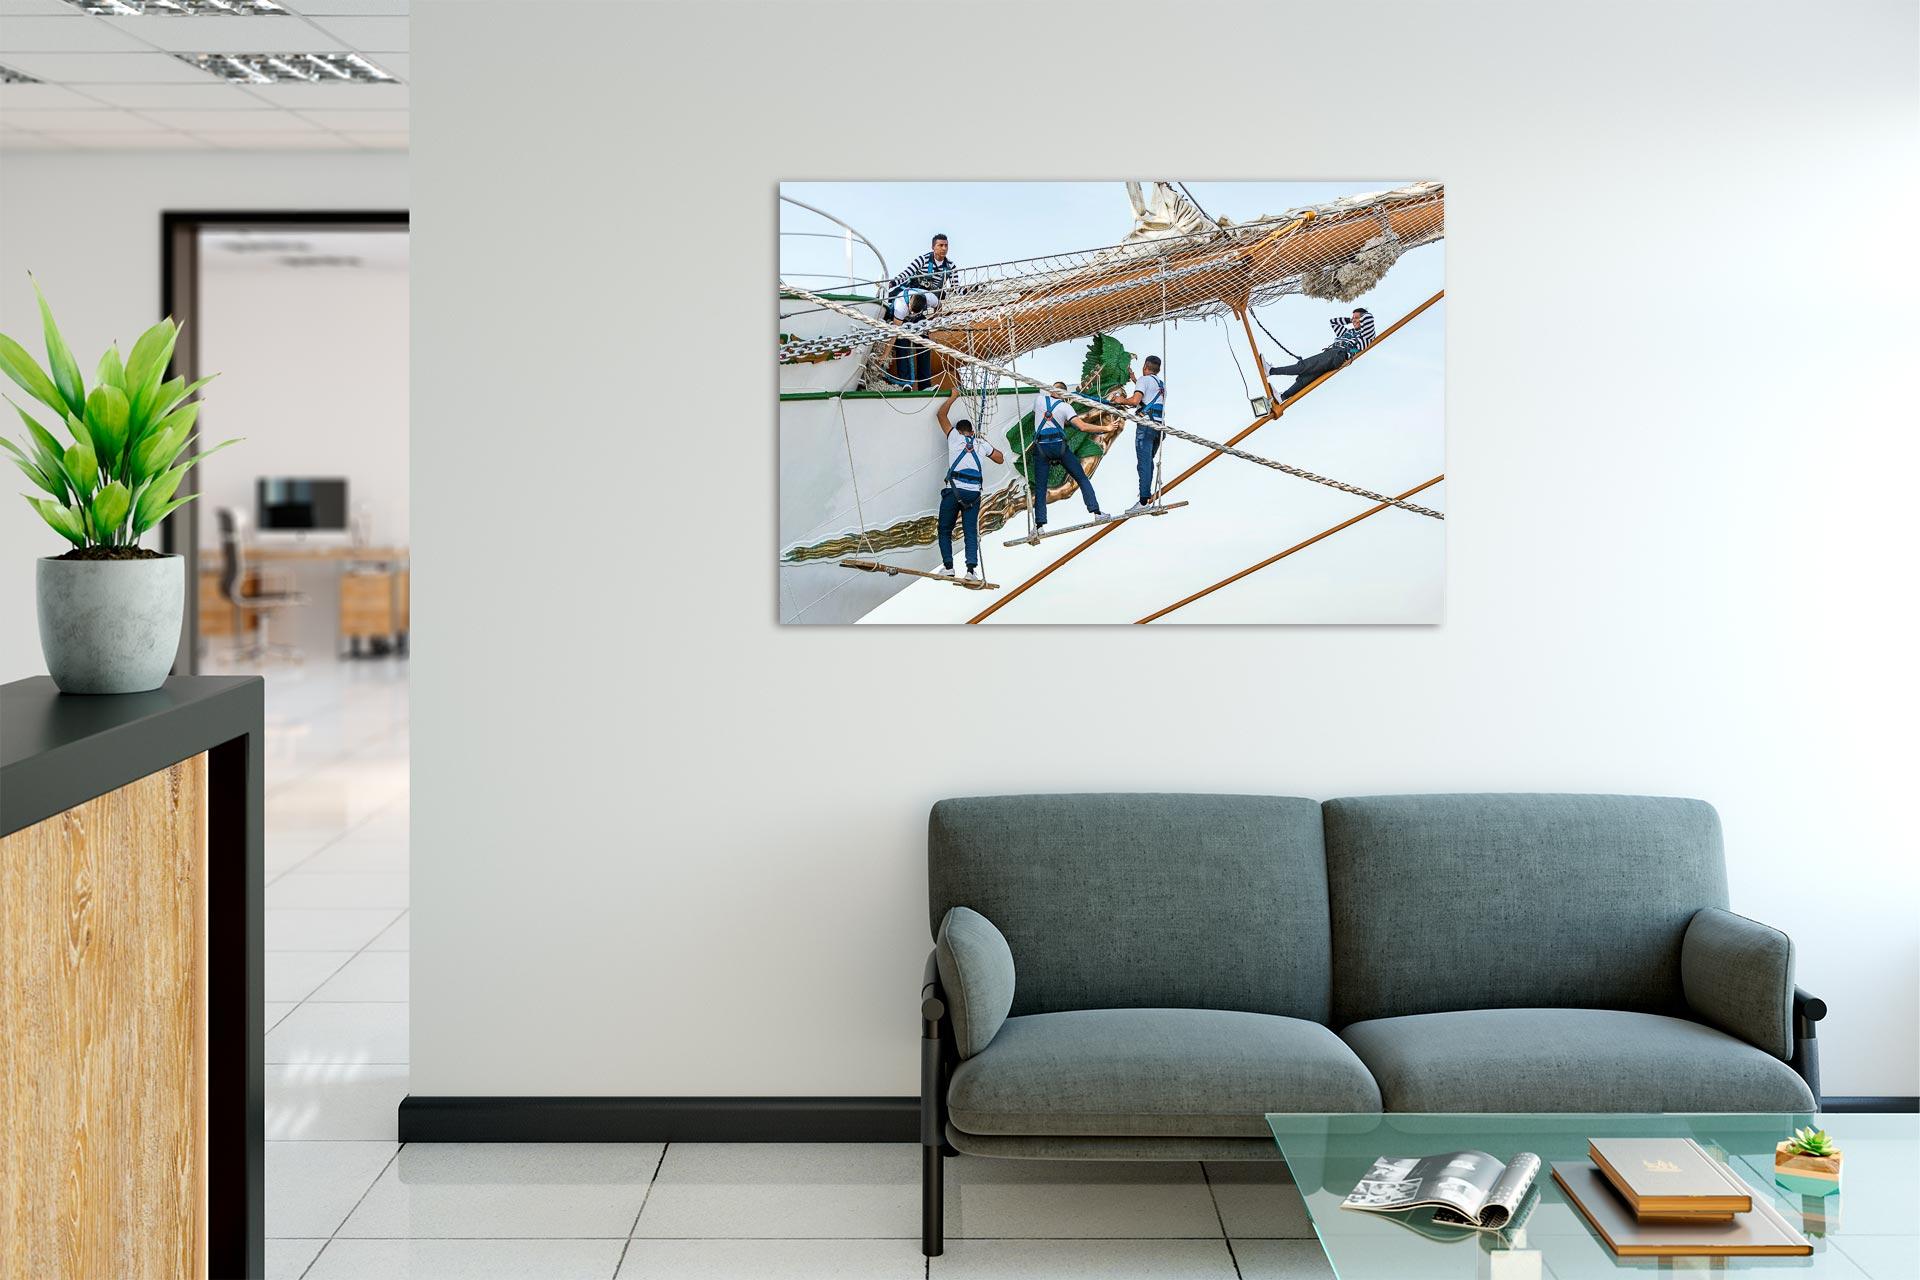 LCW263-marineros-hamburg-wandbild-bild-auf-leinwand-acrylglas-aludibond-empfang